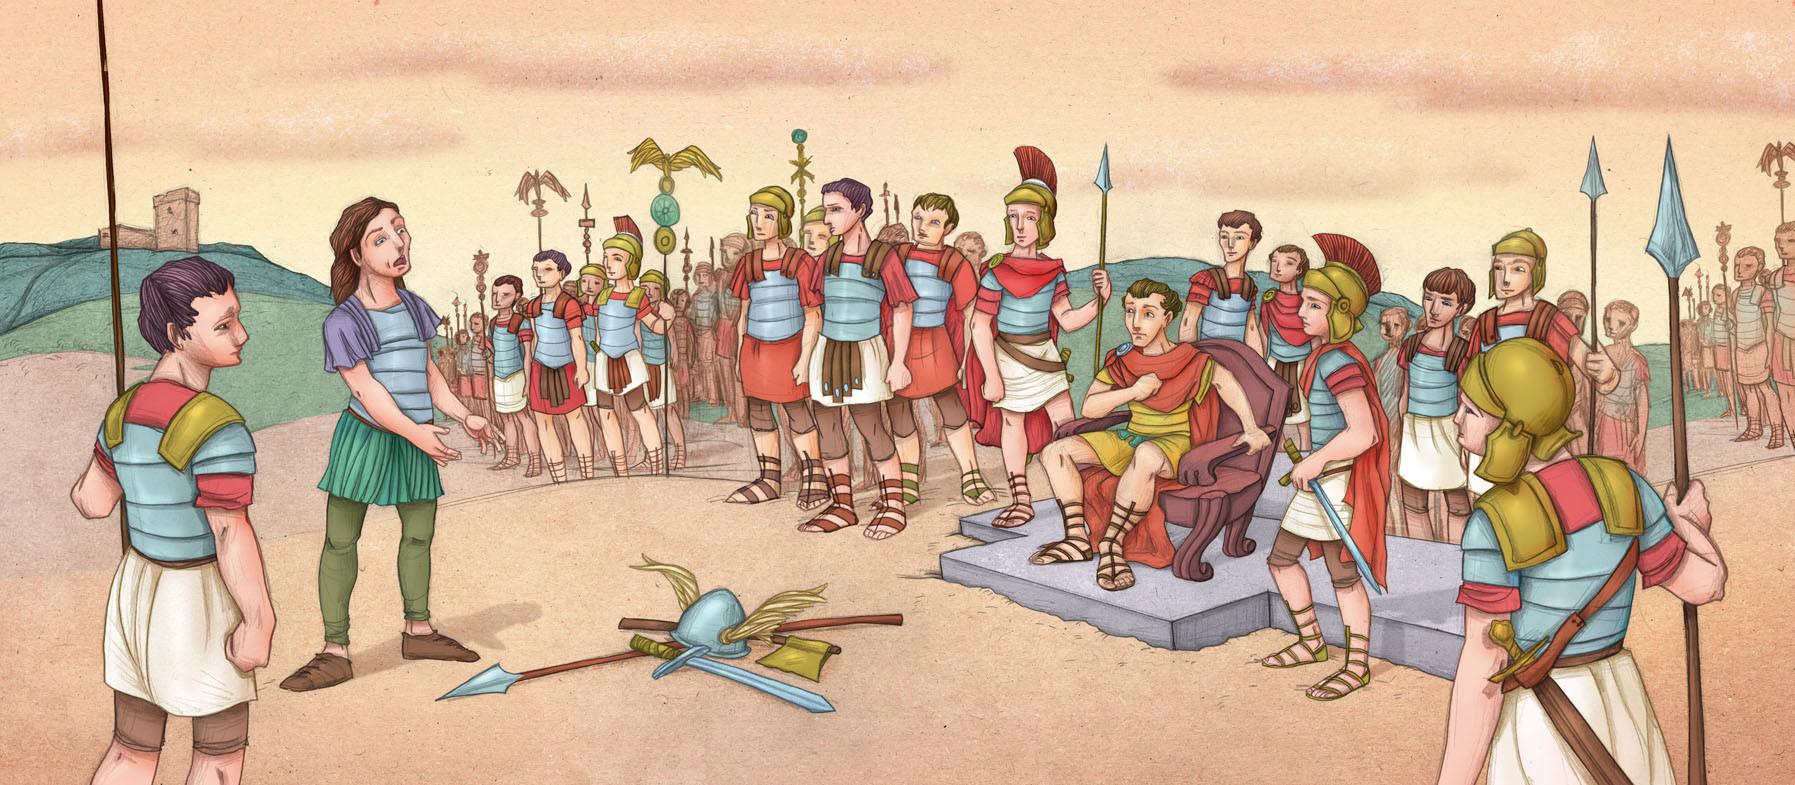 Autogiro illustration studio romans ancient history 2